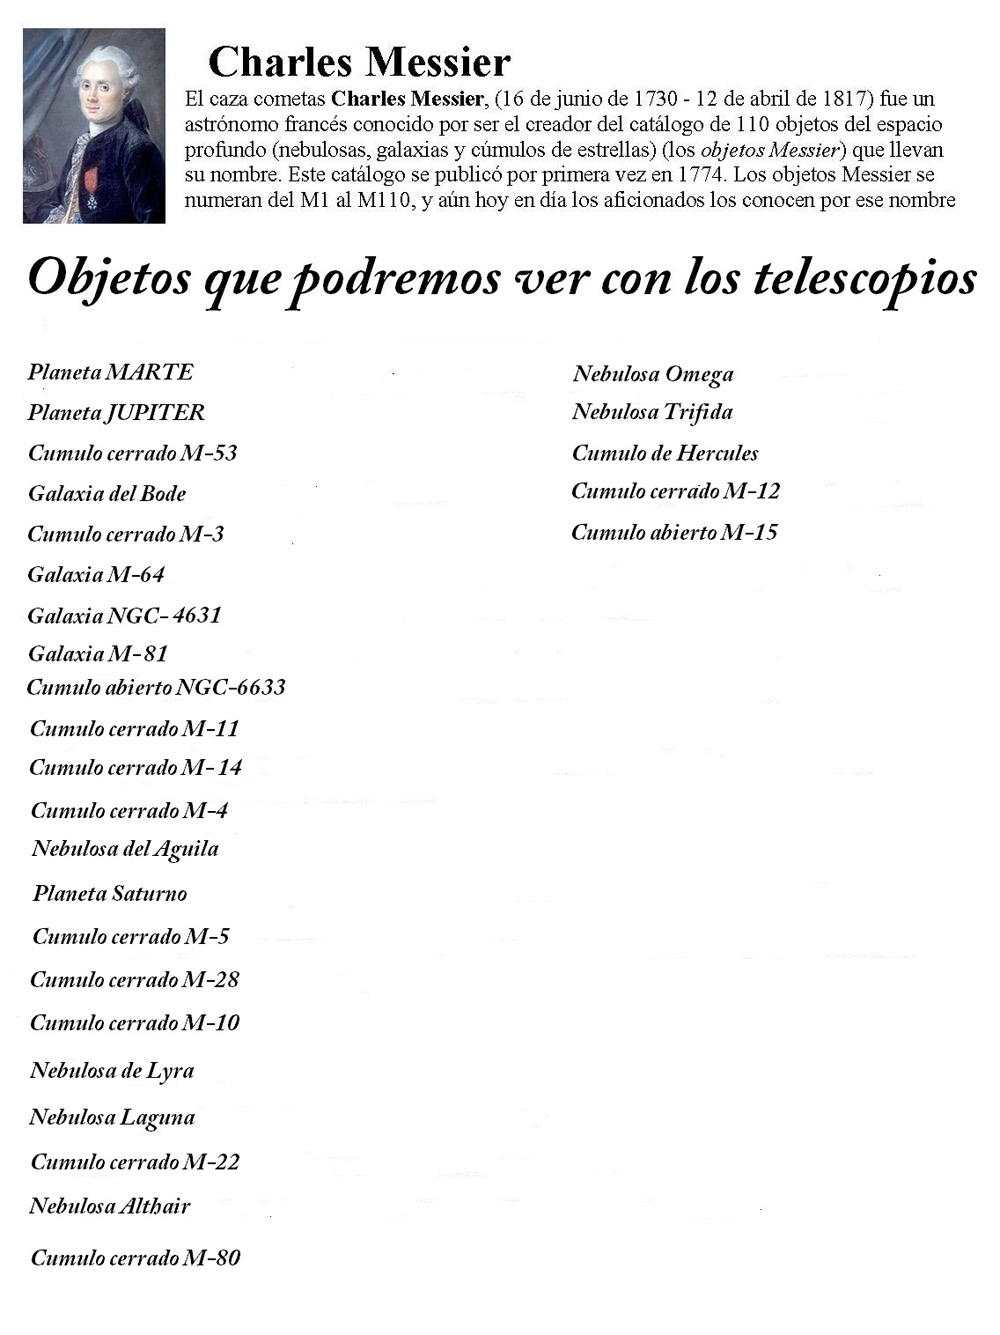 adjuntovertelescopios